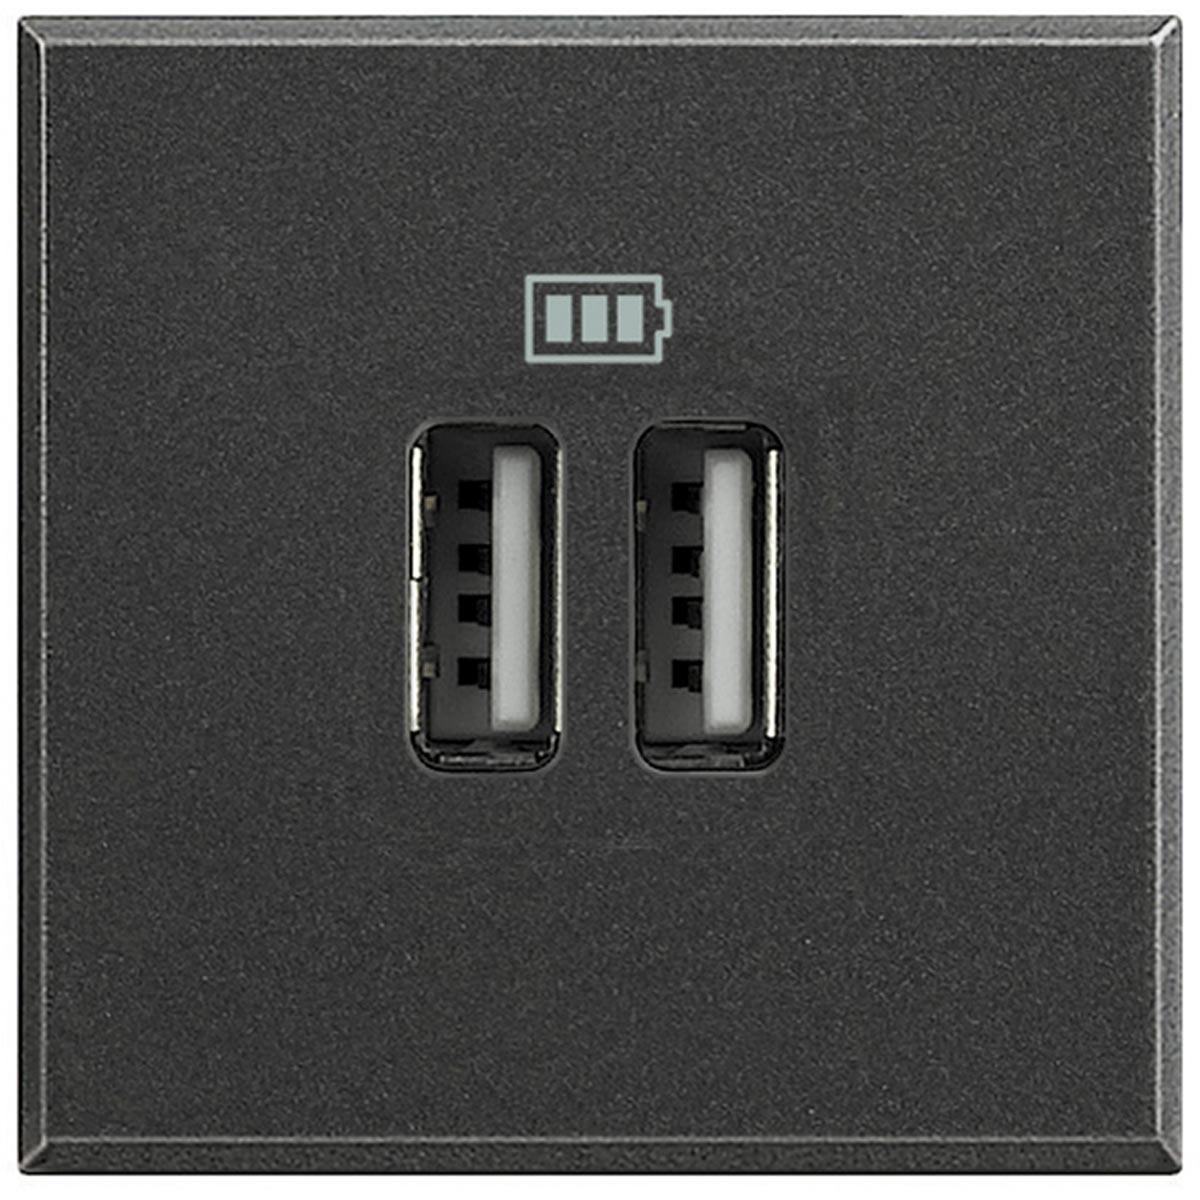 Caricatore USB Bticino Axolute Scura HS4285C2